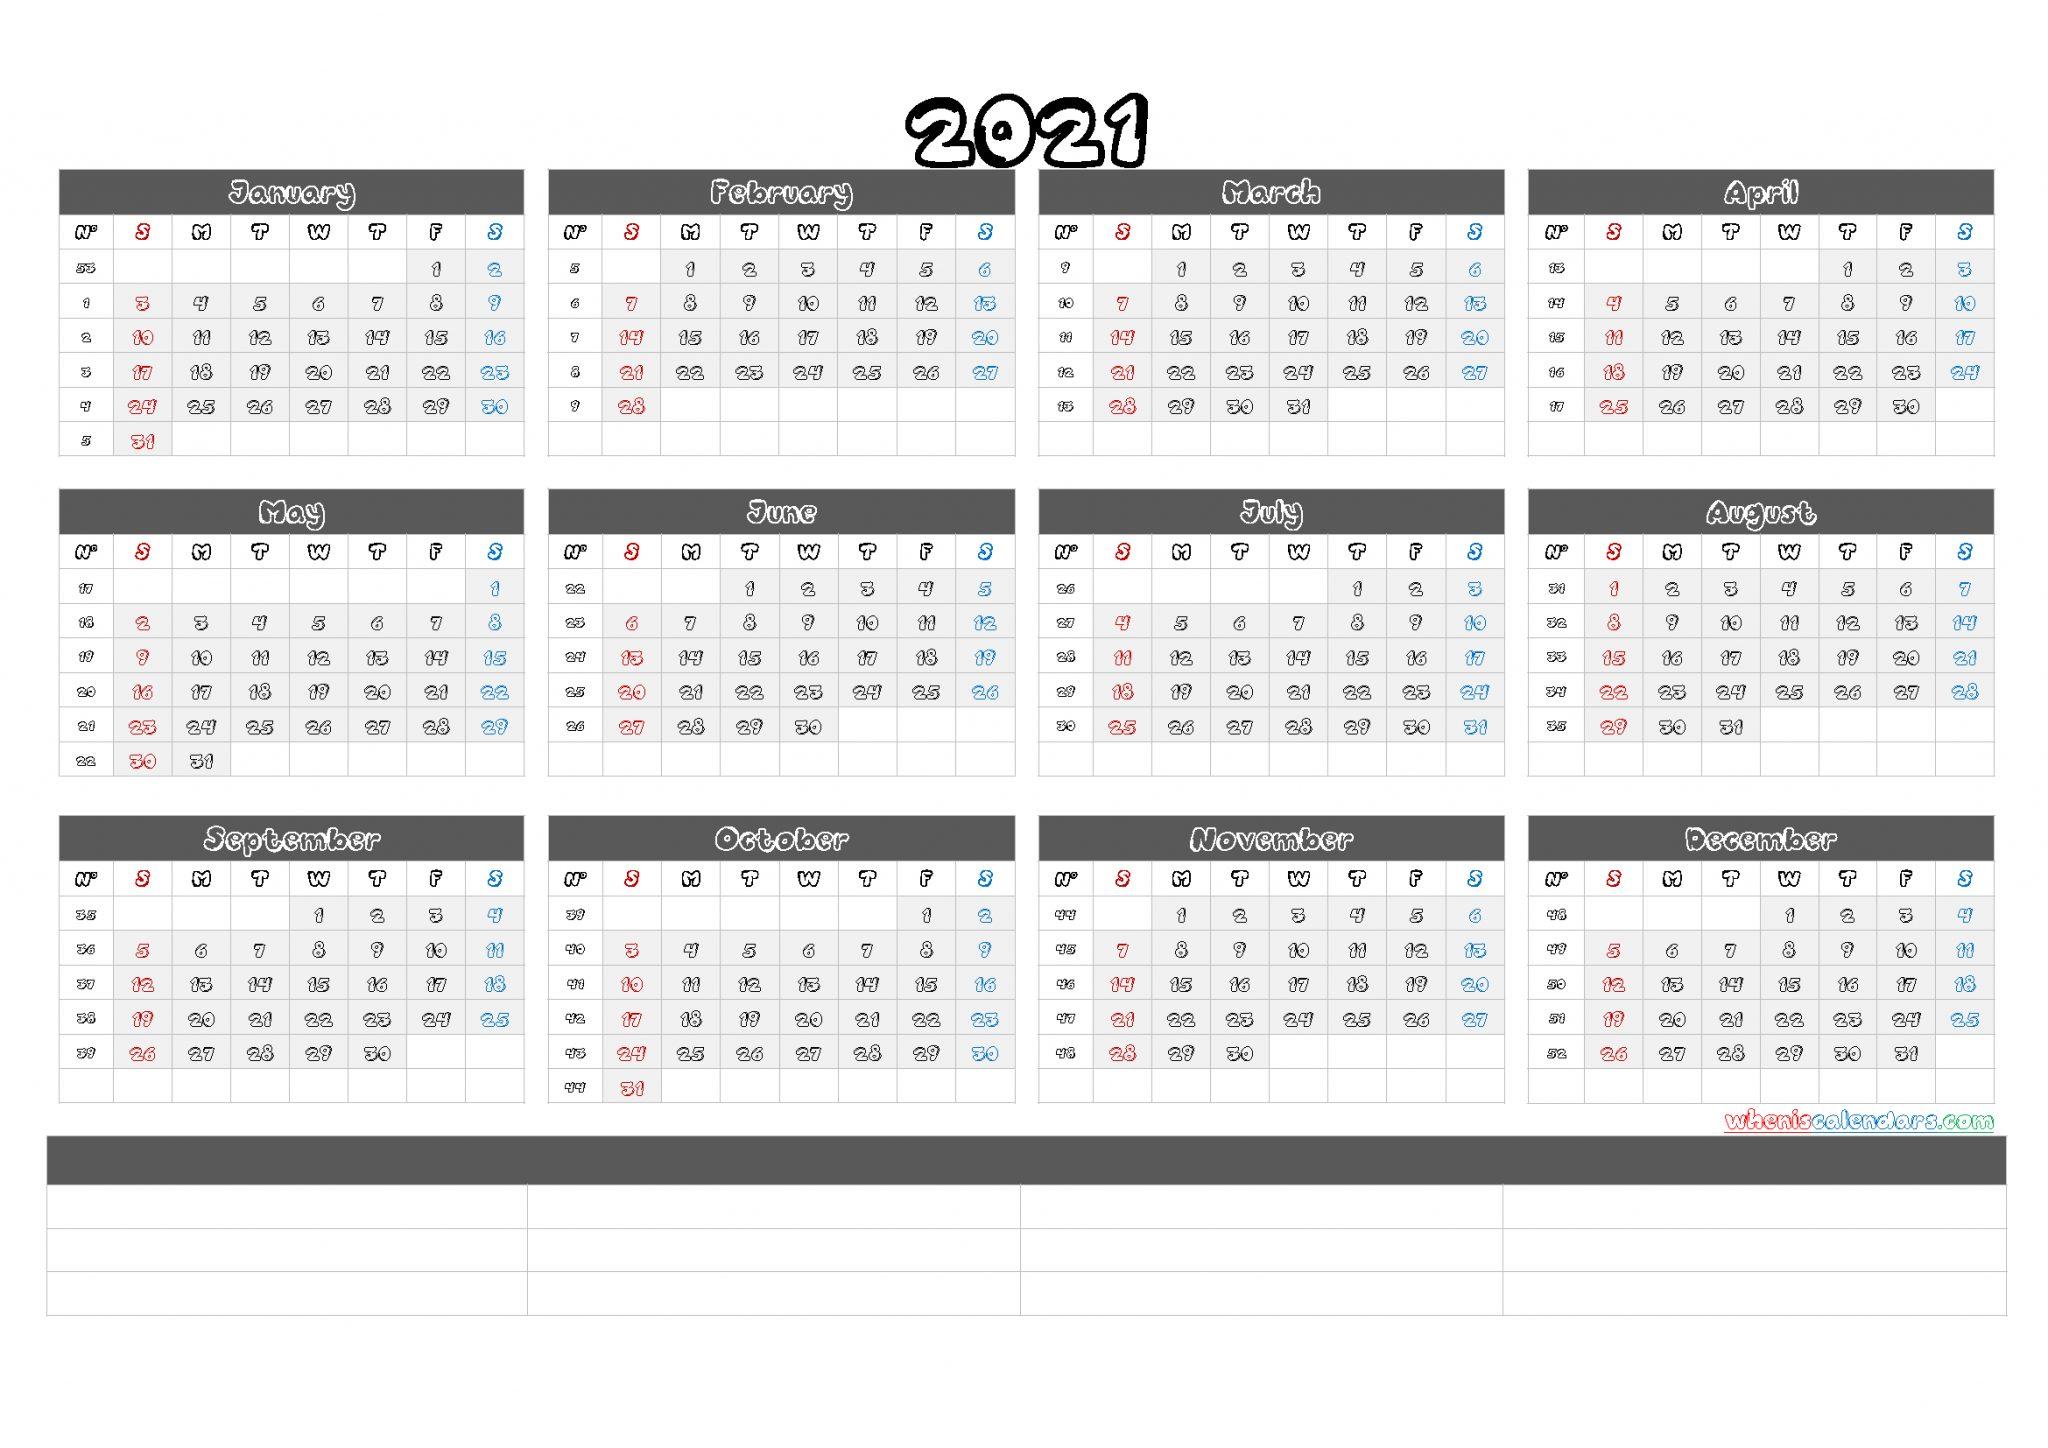 Sap 52 Week Numbered Calendar : Free Calendar Template With Regard To 52 Week Calendar